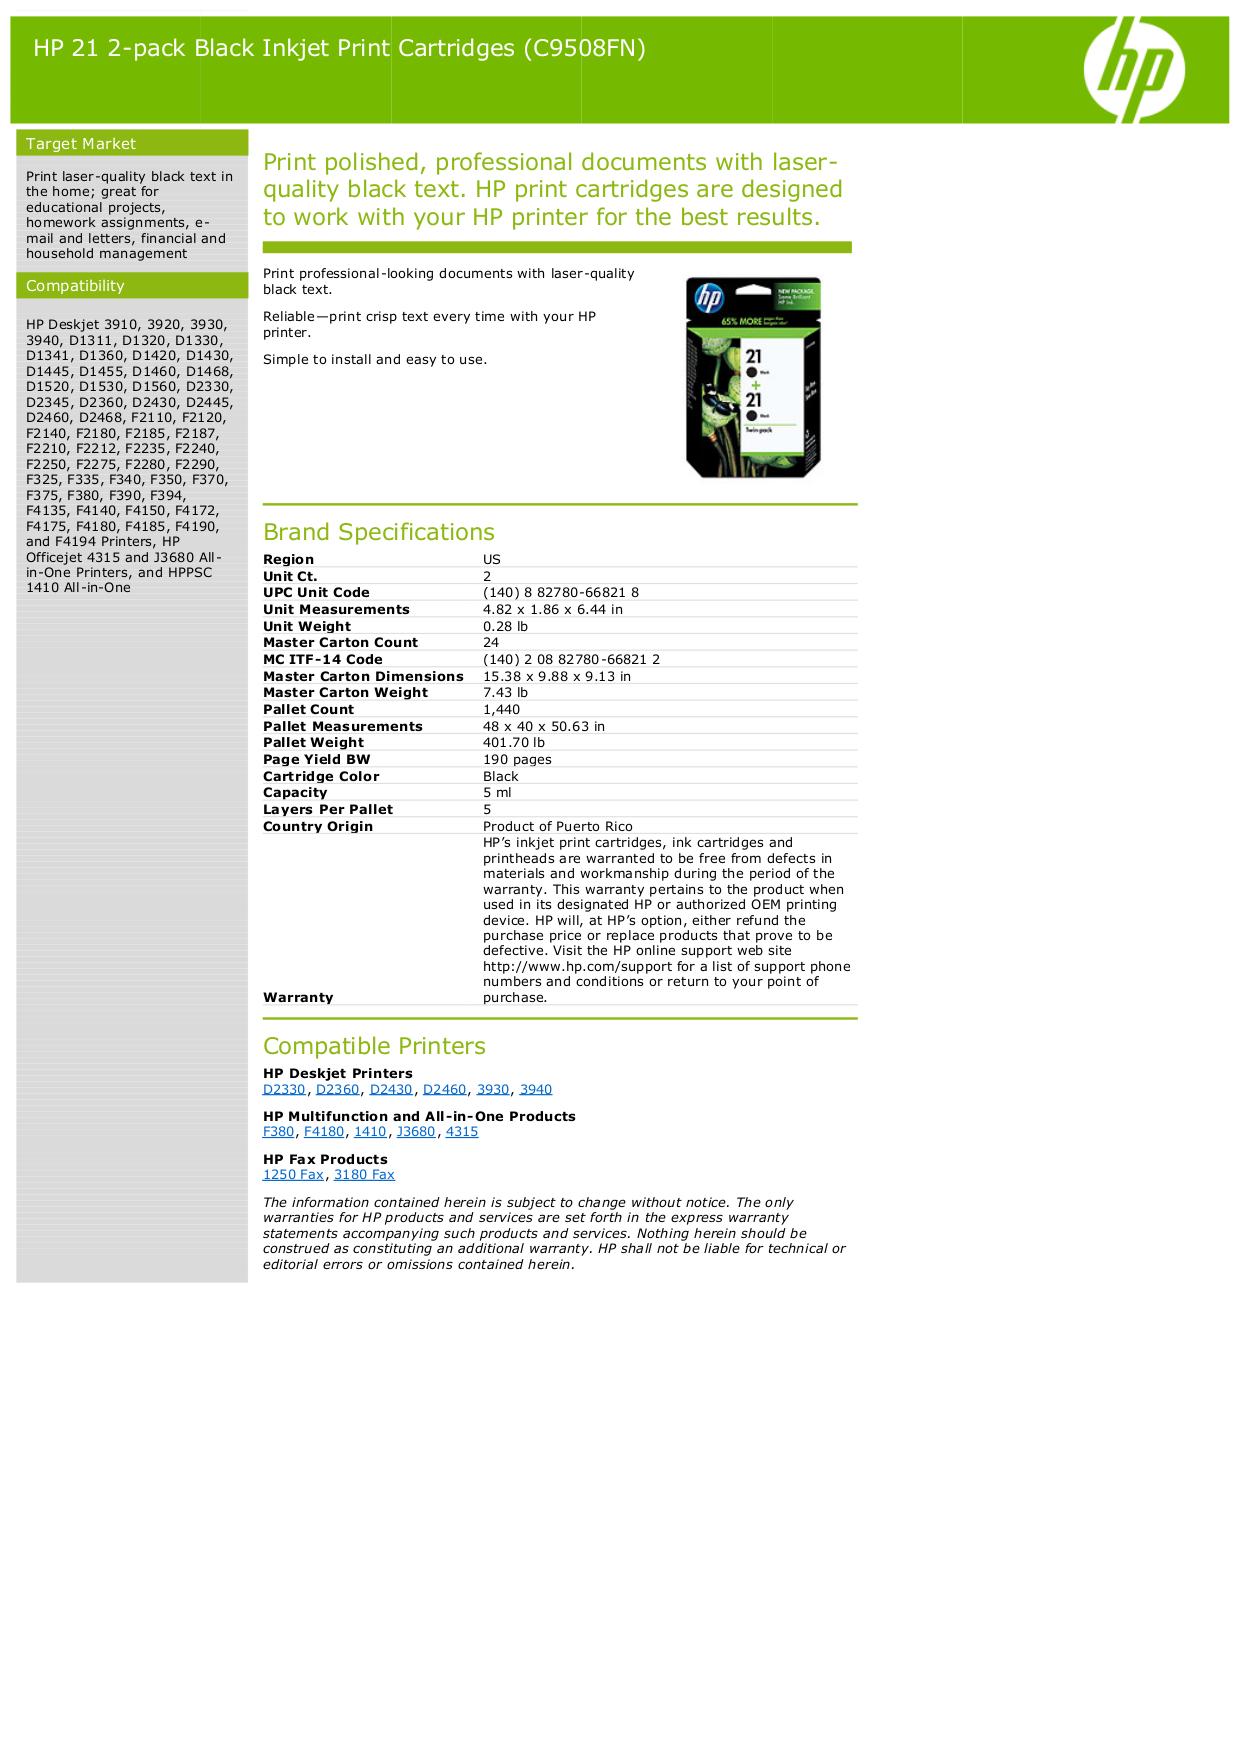 pdf for HP Multifunction Printer Deskjet F325 manual